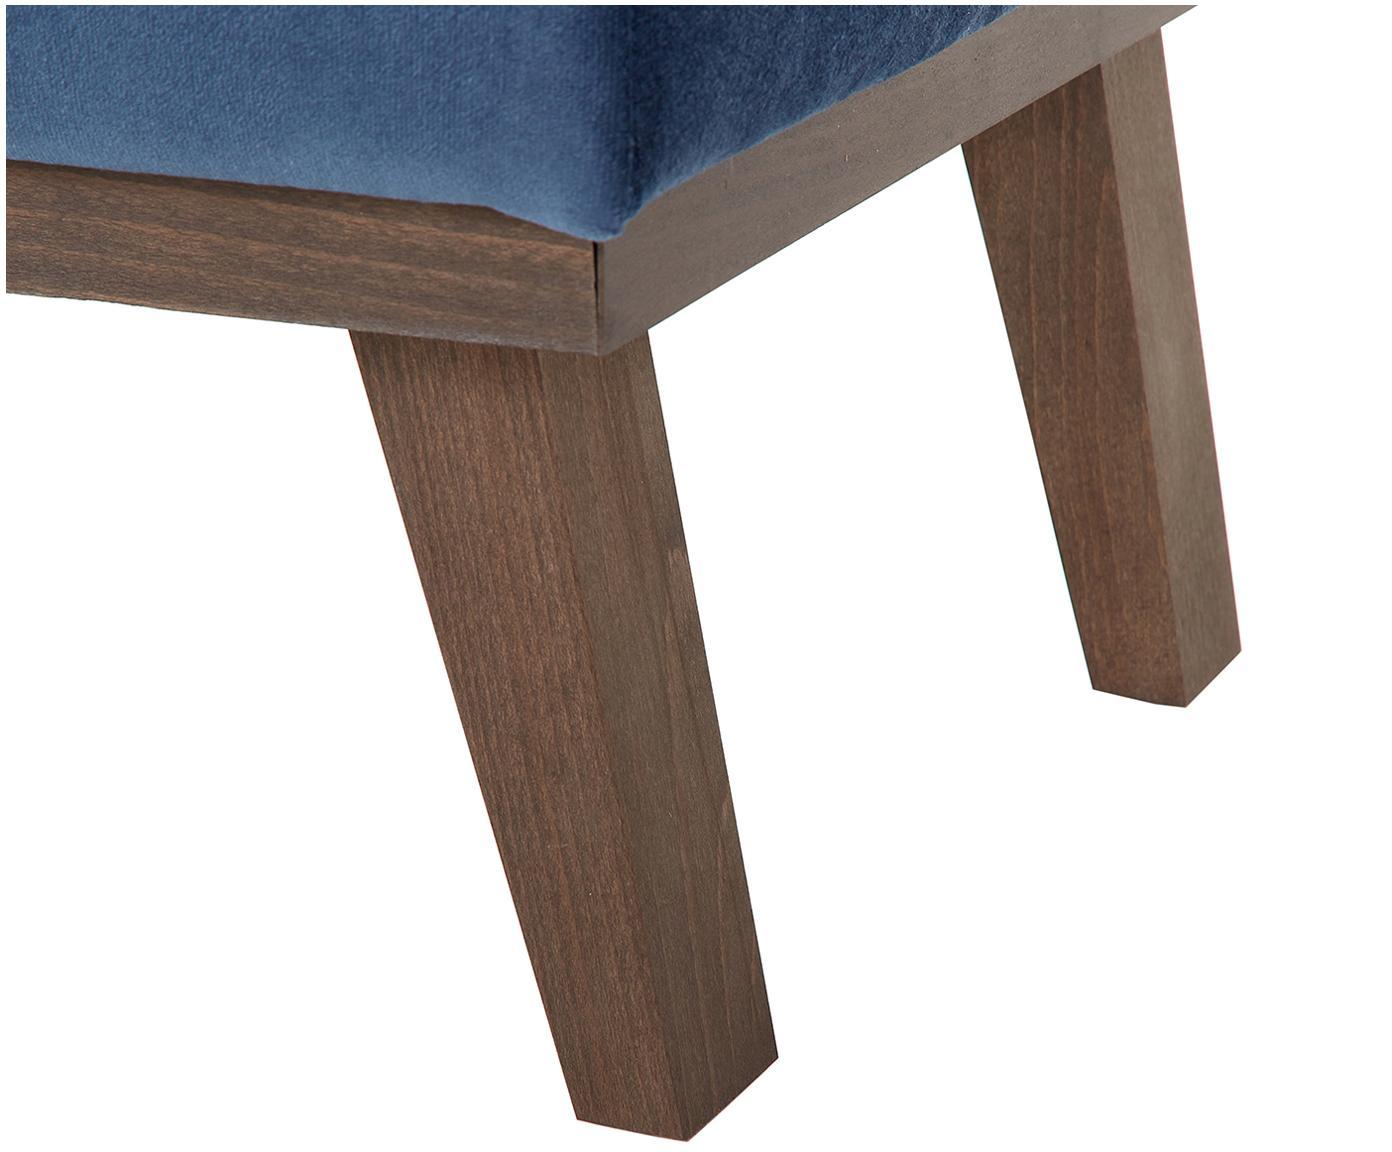 Sofa-Hocker Alva aus Samt, Bezug: Samt (Hochwertiger Polyes, Gestell: Massives Kiefernholz, Füße: Massives Buchenholz, gebe, Dunkelblau, 74 x 30 cm